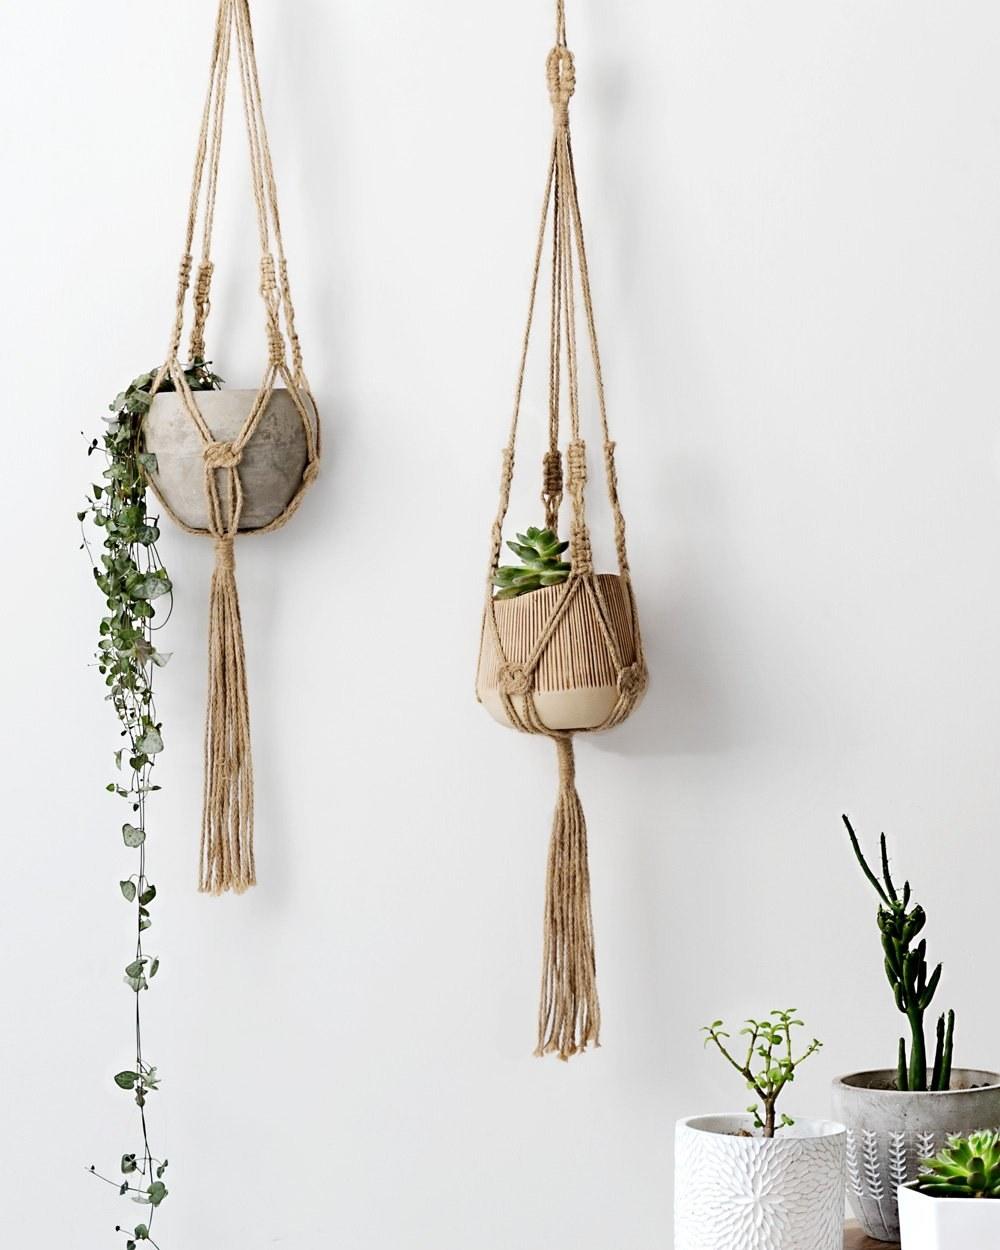 Boho macrame planters holding potted plants